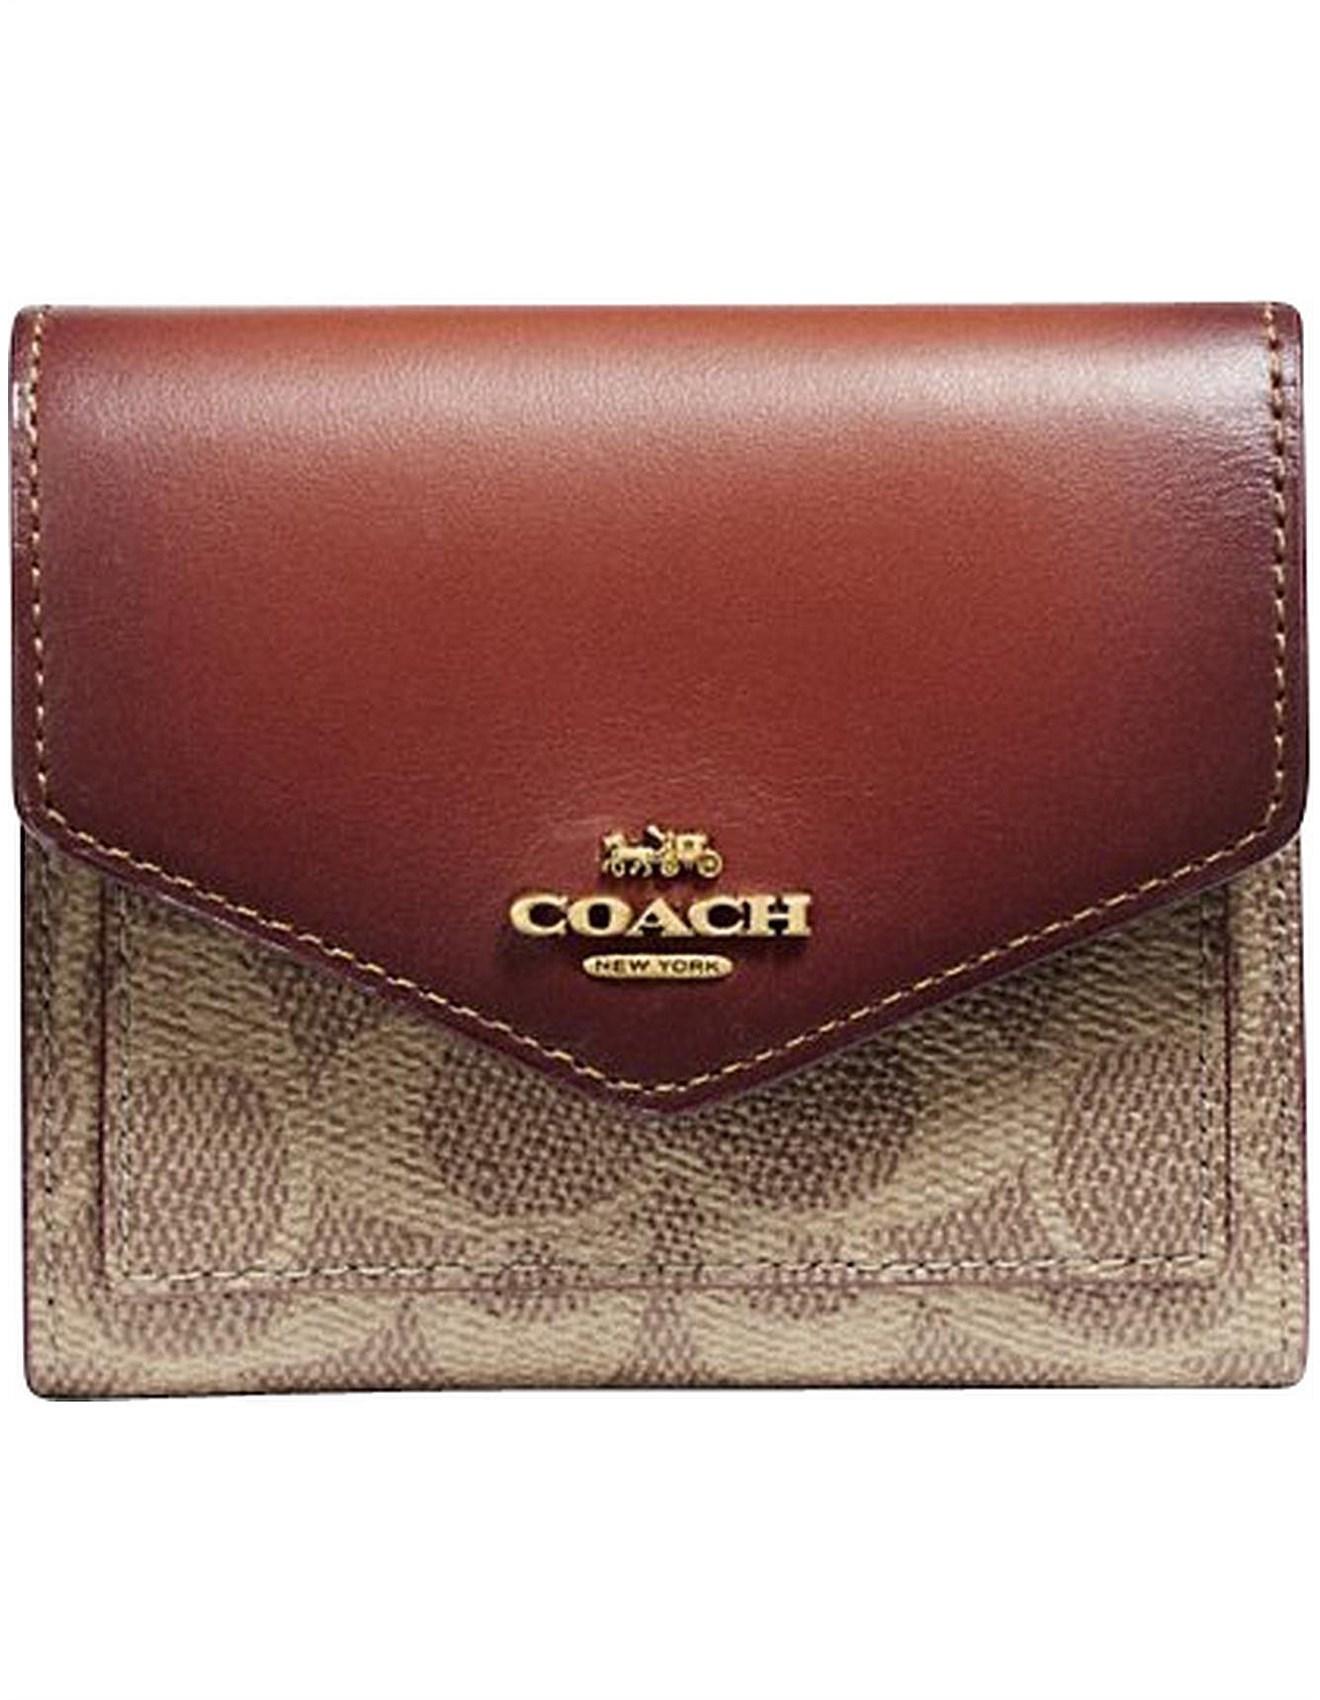 c75b2029 Coach | Buy Coach Bags, Handbags & Wallets Online | David Jones ...